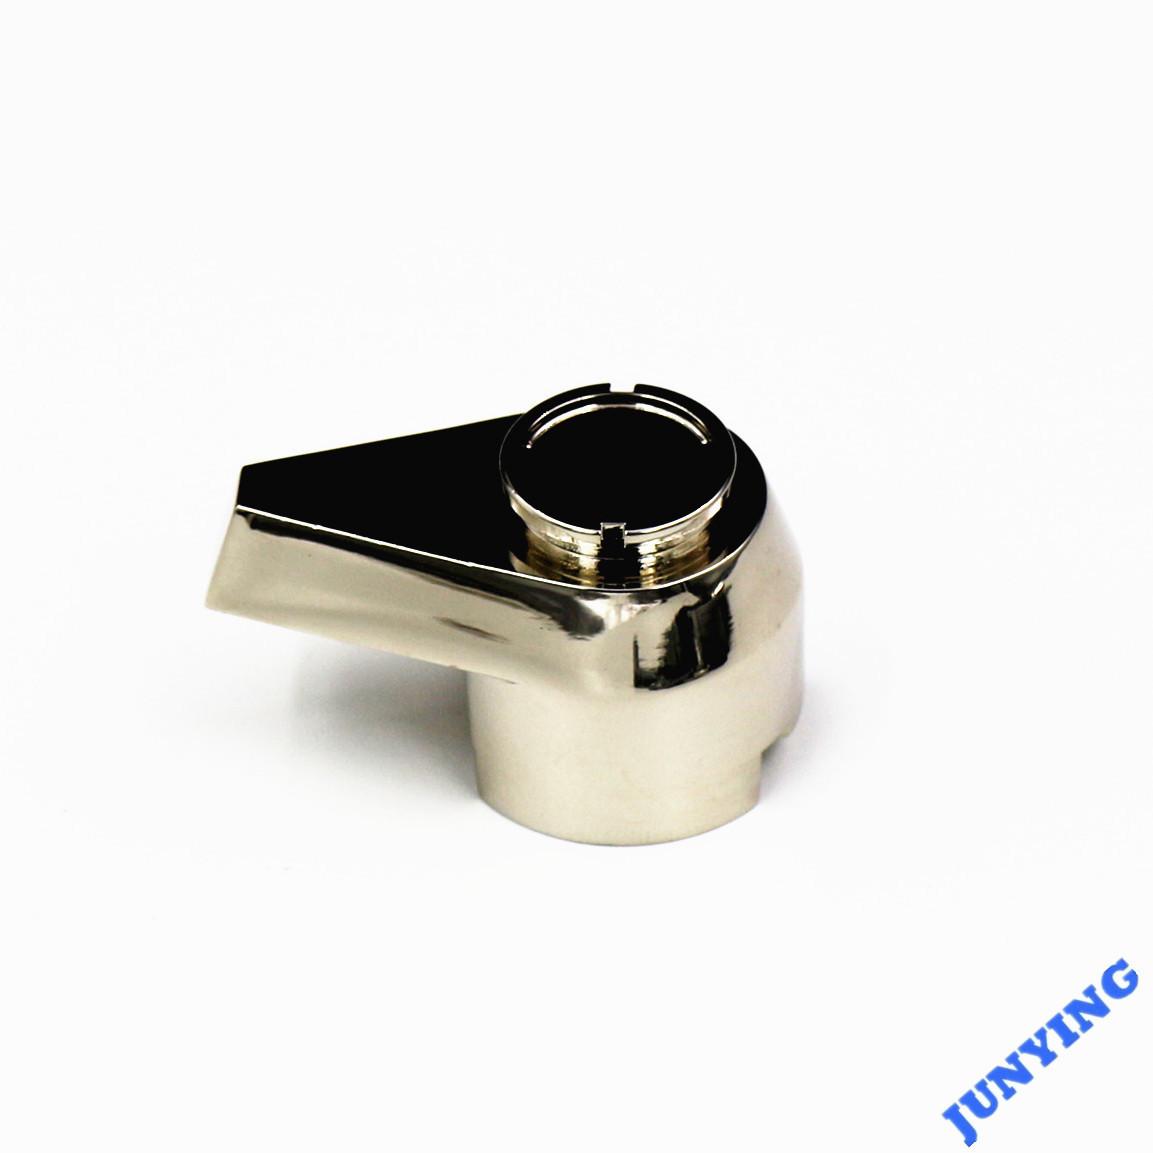 Parts for Ratchet Locks